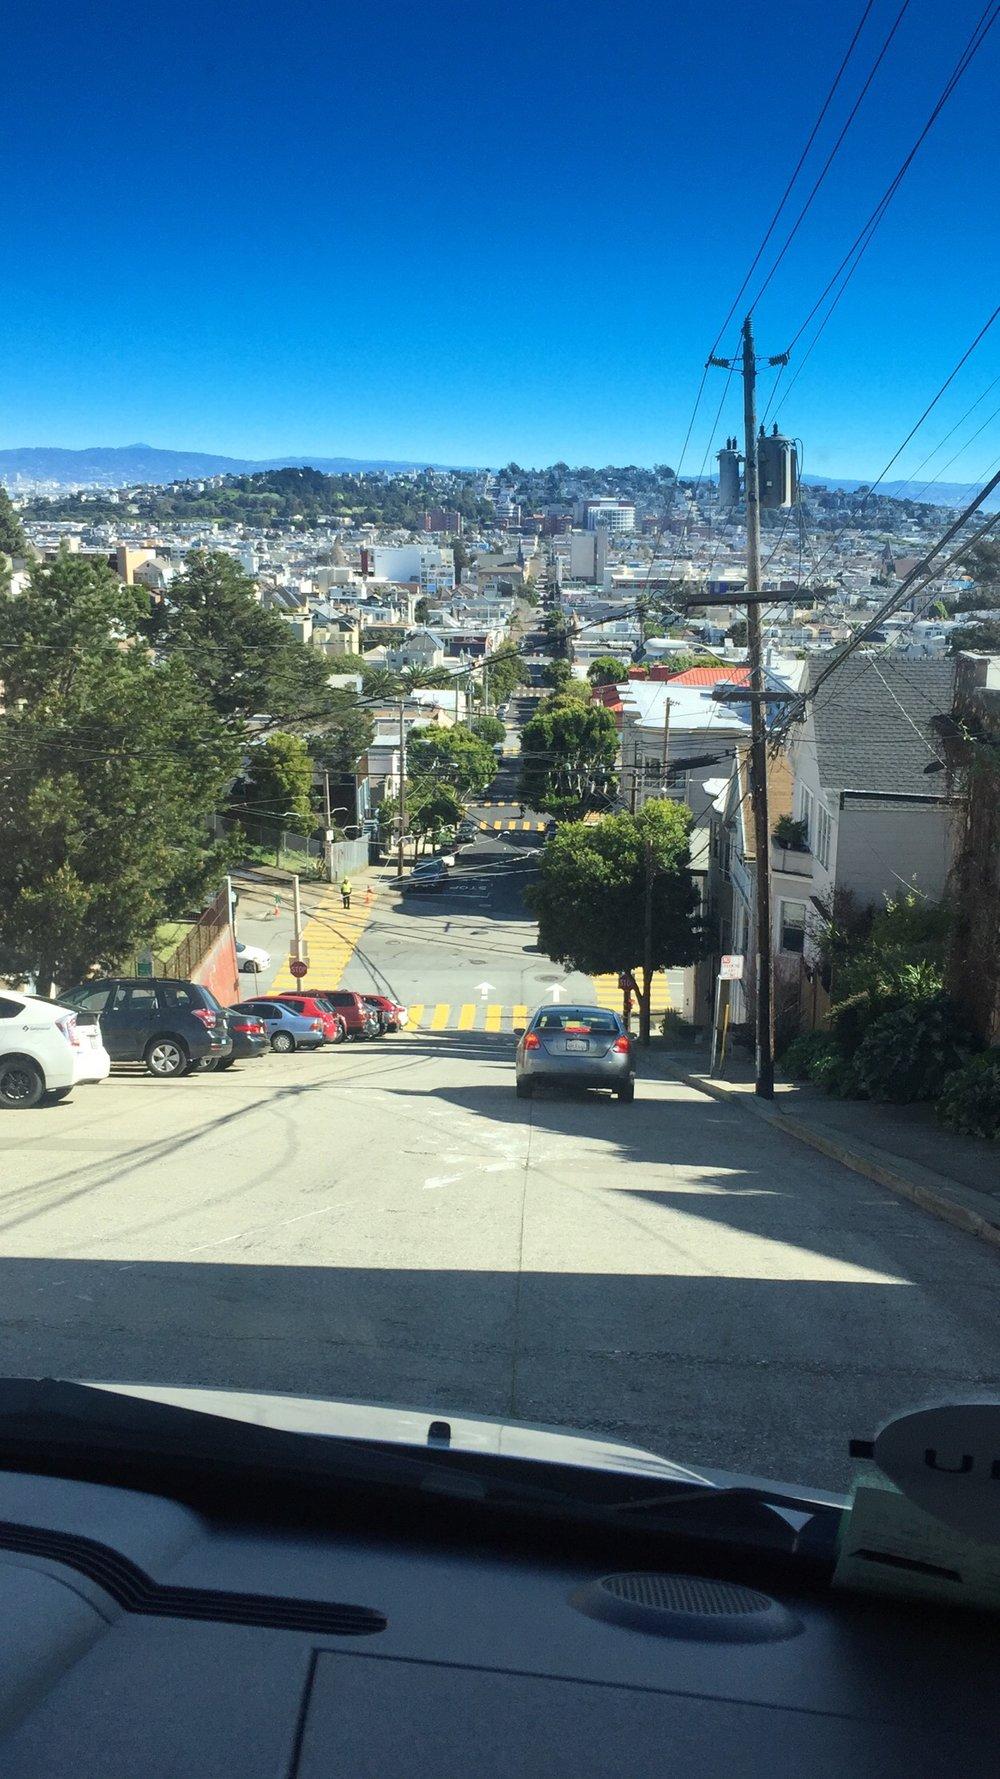 Mobile program for depression treatment in San Francisco Bay Area